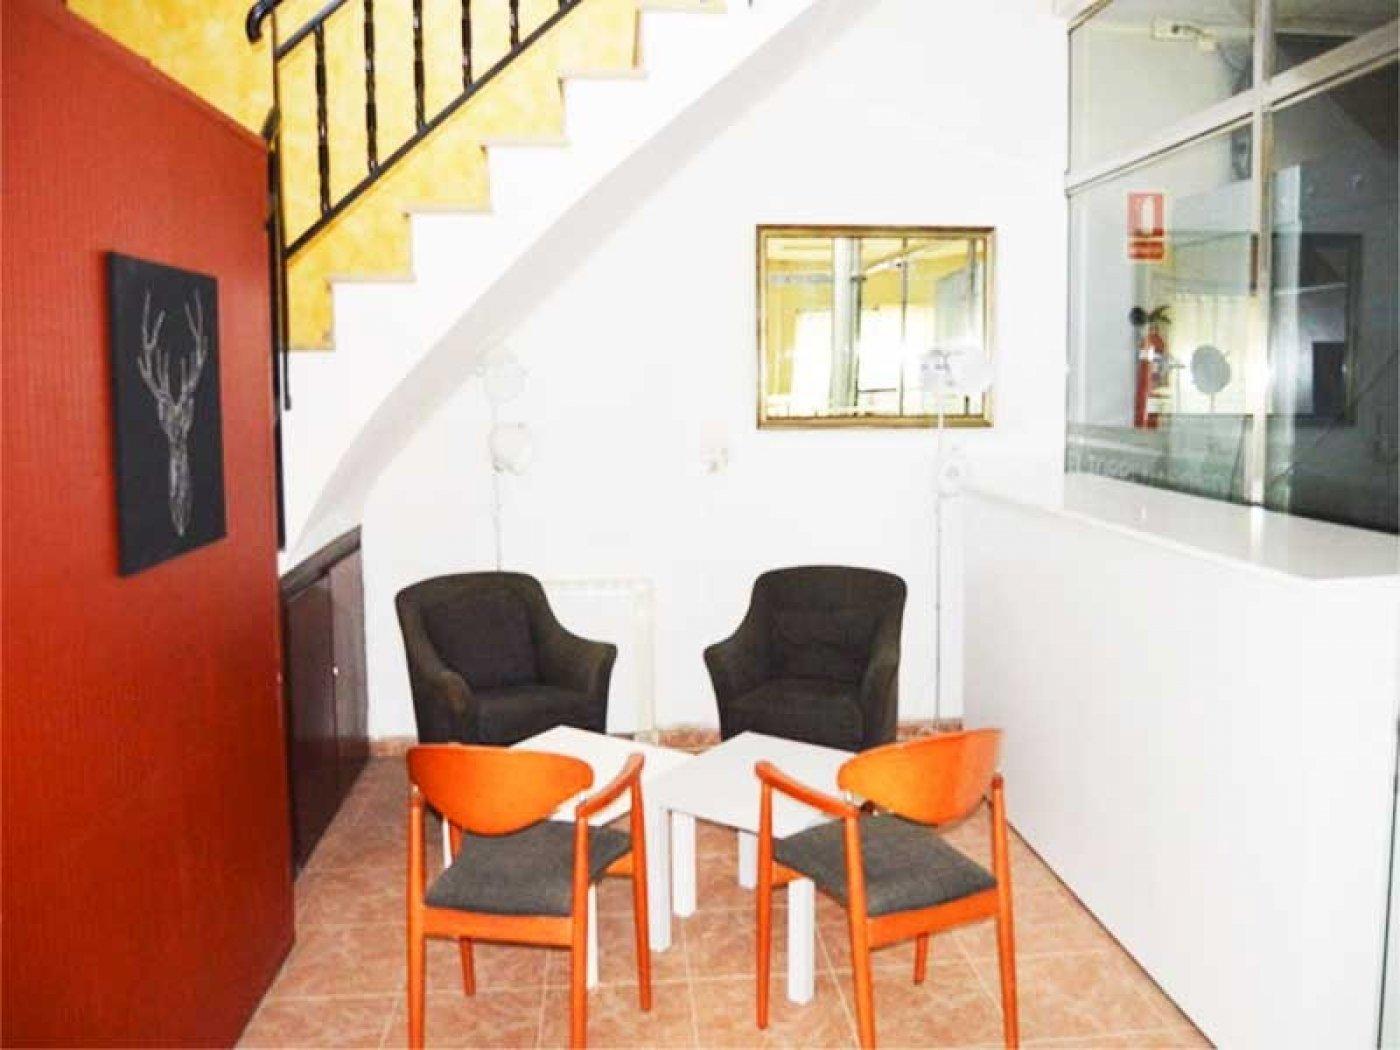 Nave restaurante en polígono cerca de sant sadurní d´anoia - imagenInmueble17